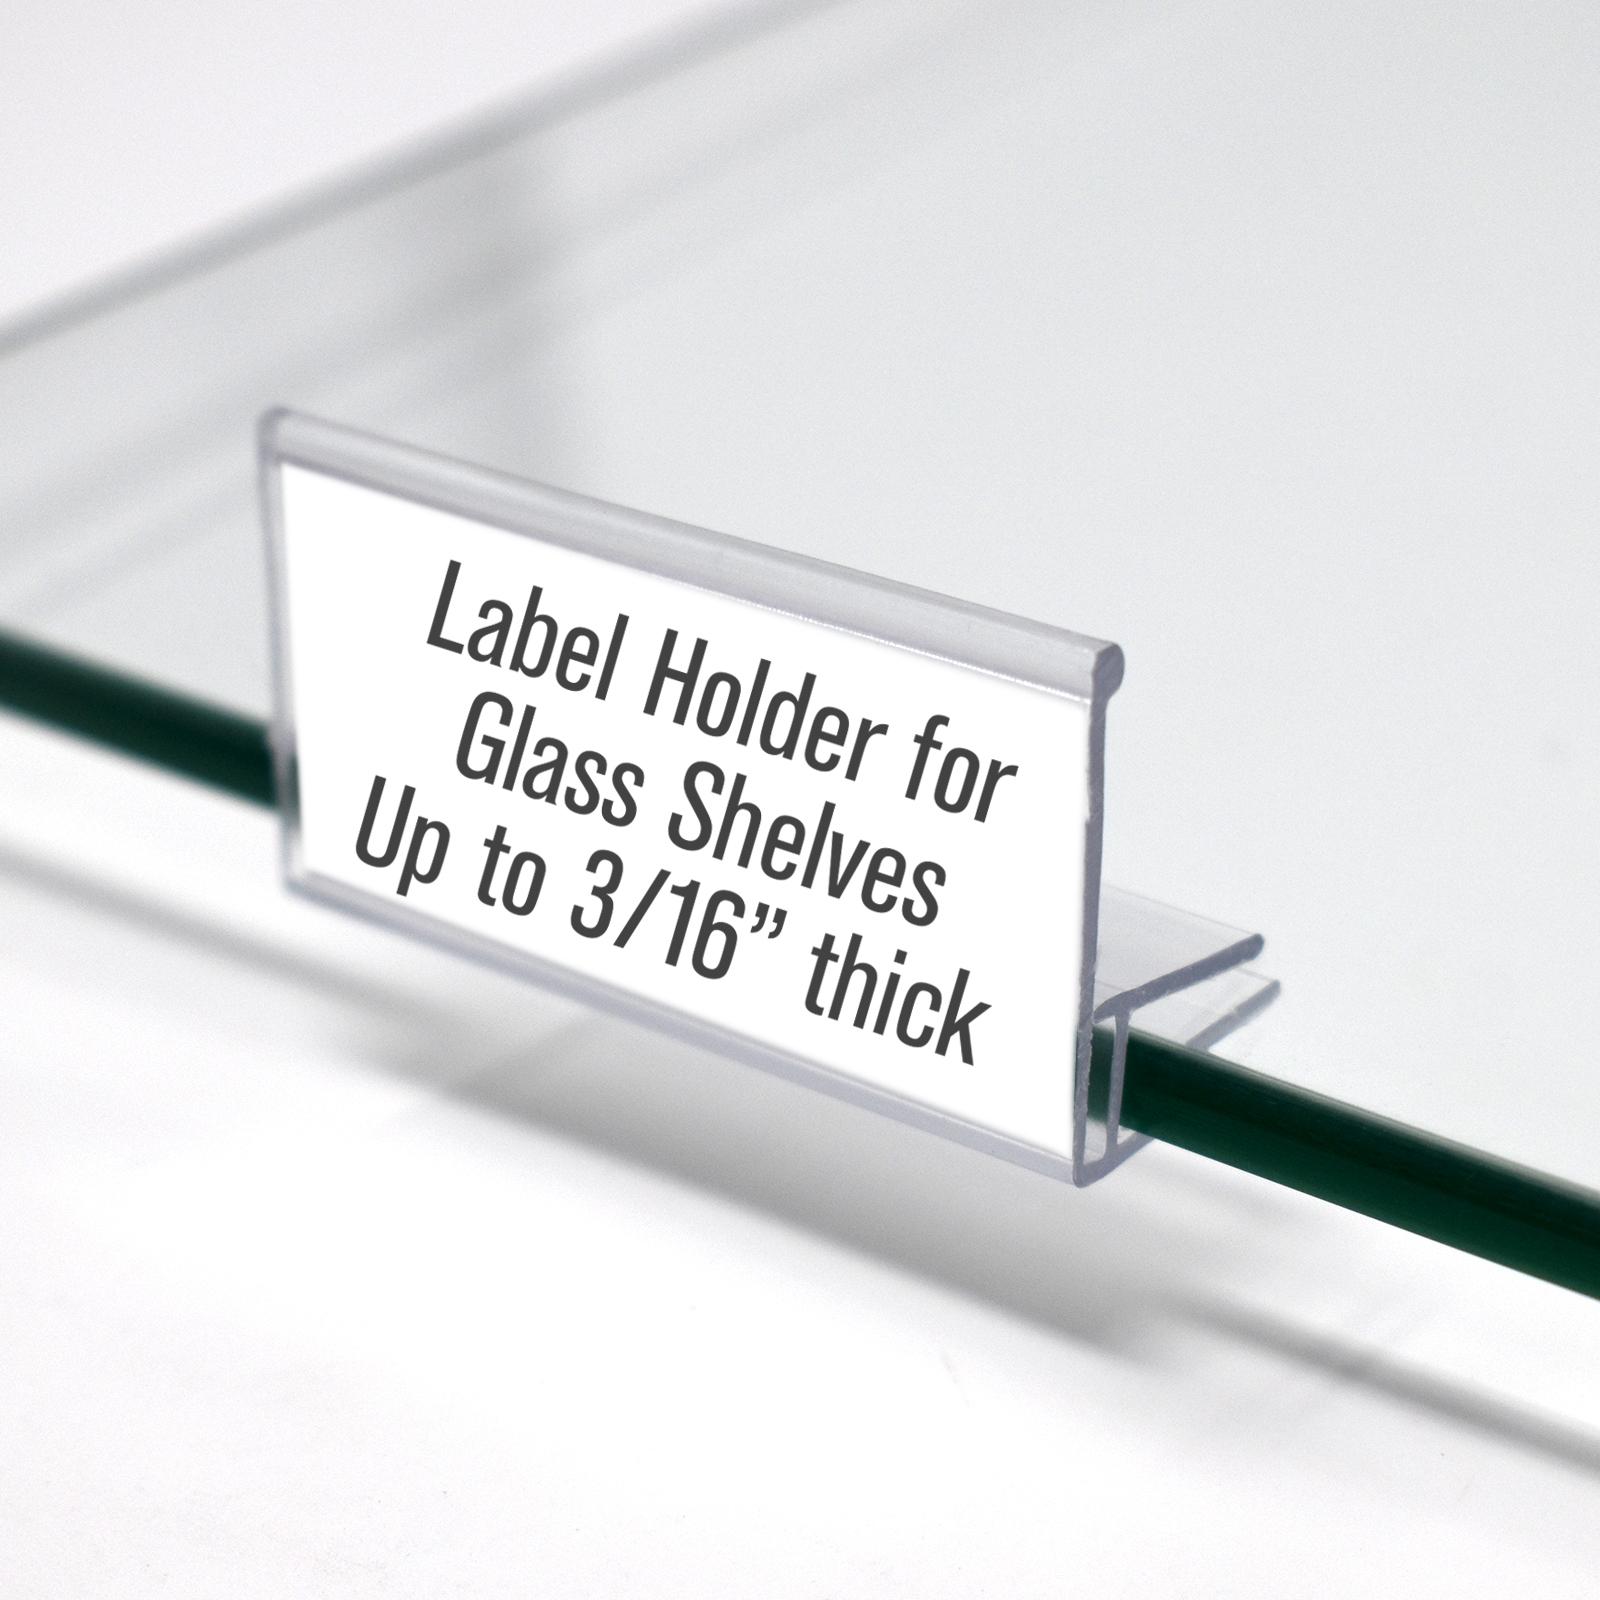 Amazing Glass Shelf Clip On Label Holder 50 Pack Home Interior And Landscaping Ferensignezvosmurscom